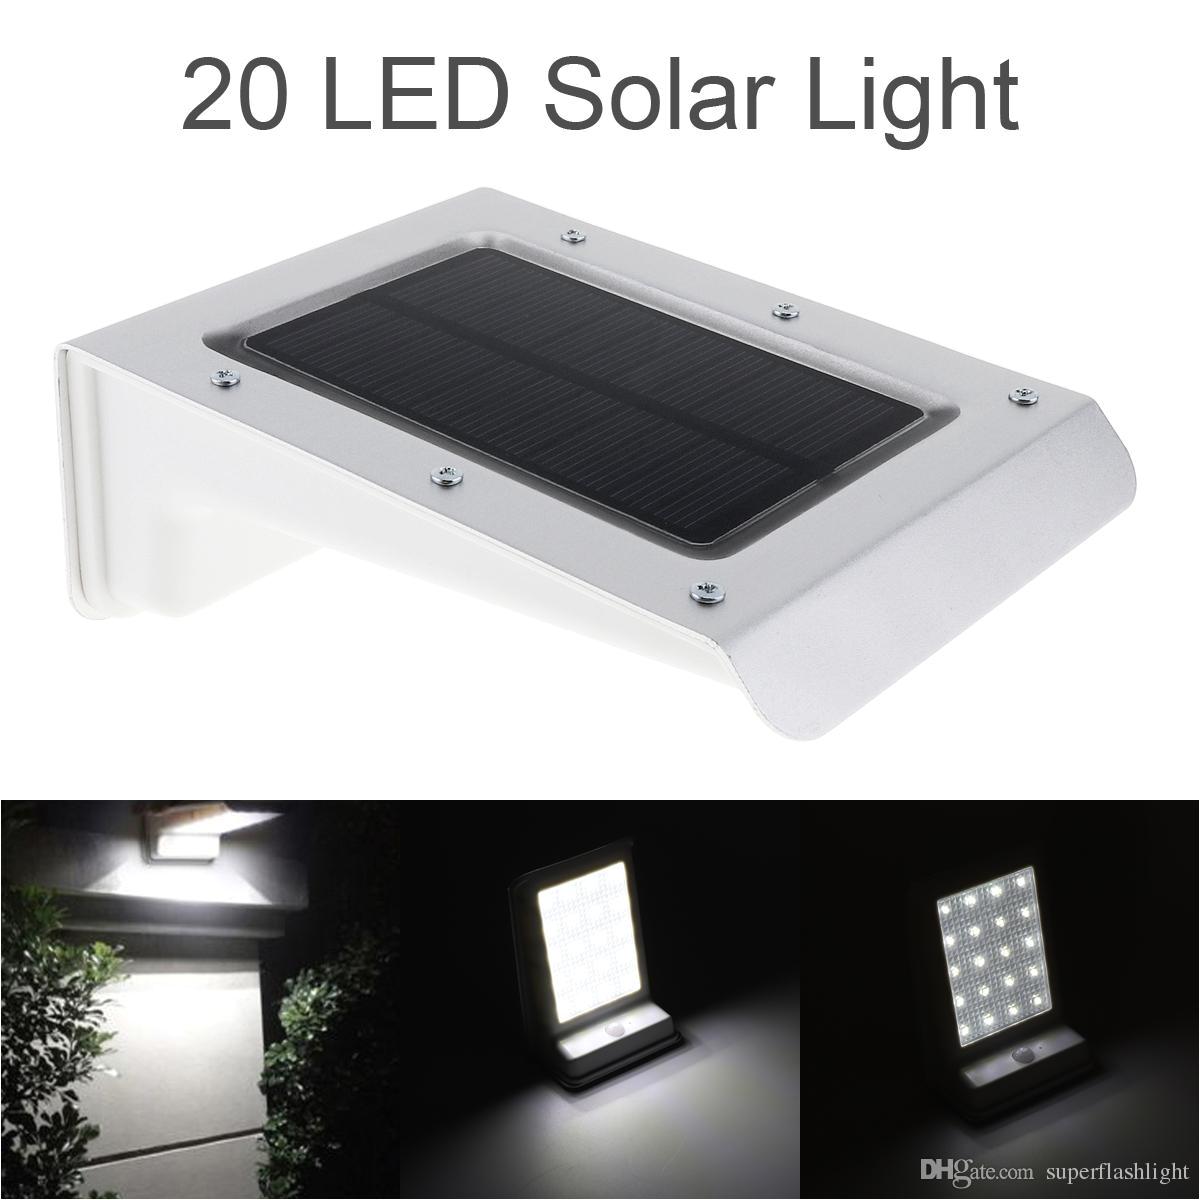 2018 aluminum waterproof 20 led solar power outdoor security light lamp pir motion sensor garden yard light leg 20z from superflashlight 11 06 dhgate